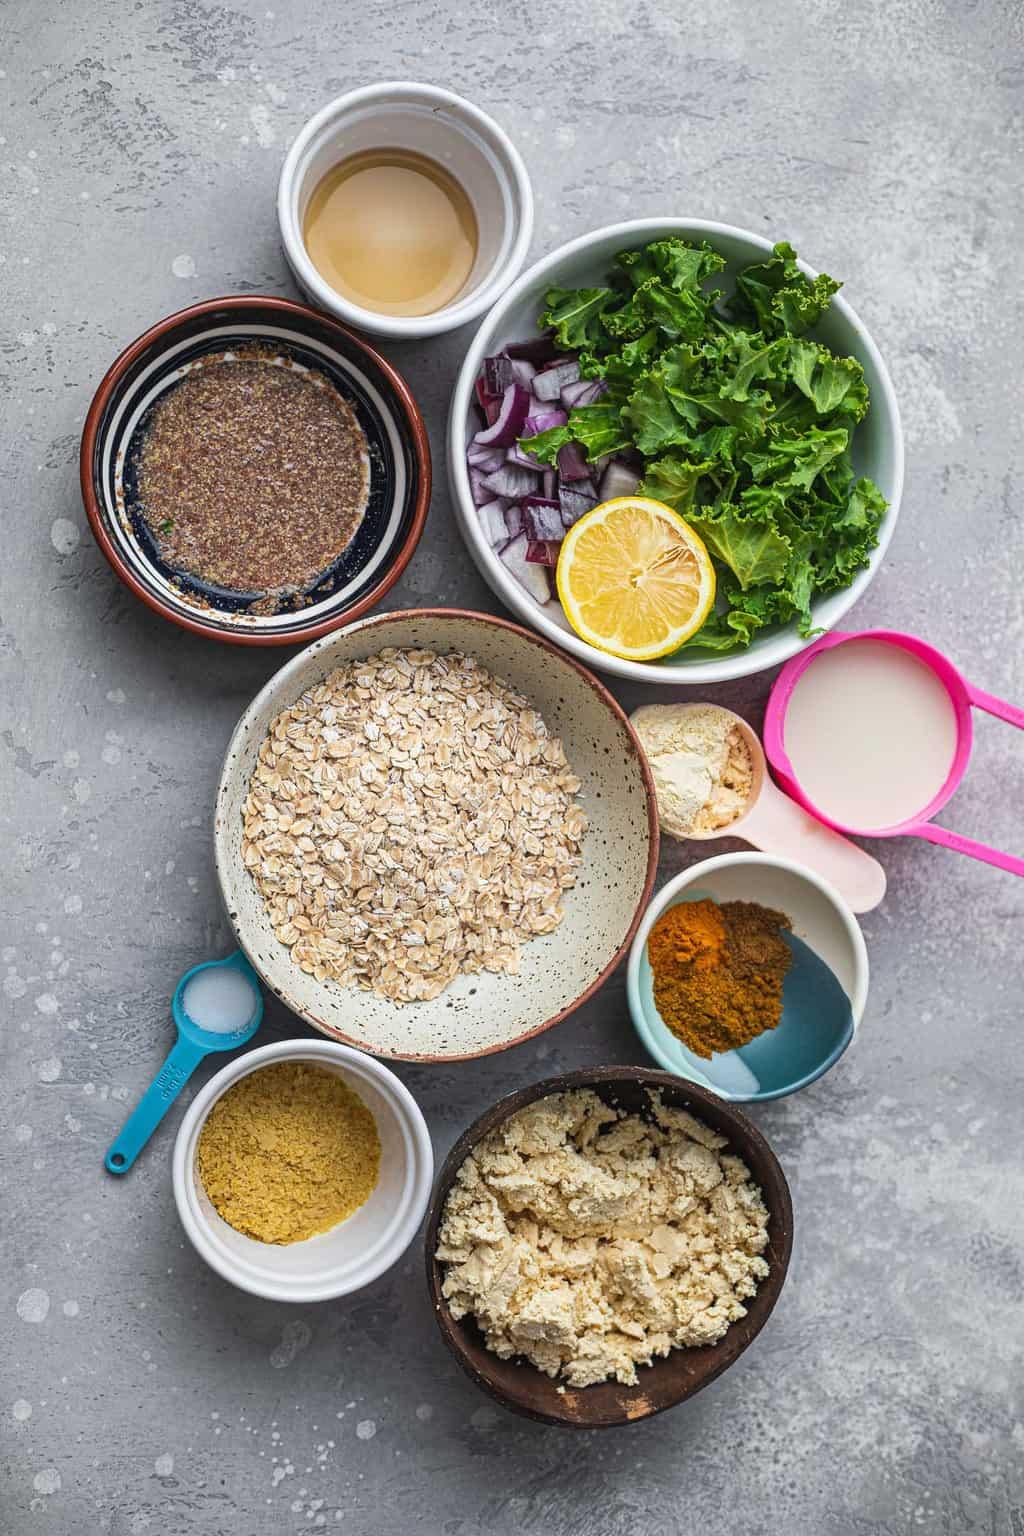 Ingredients to make vegan breakfast muffins